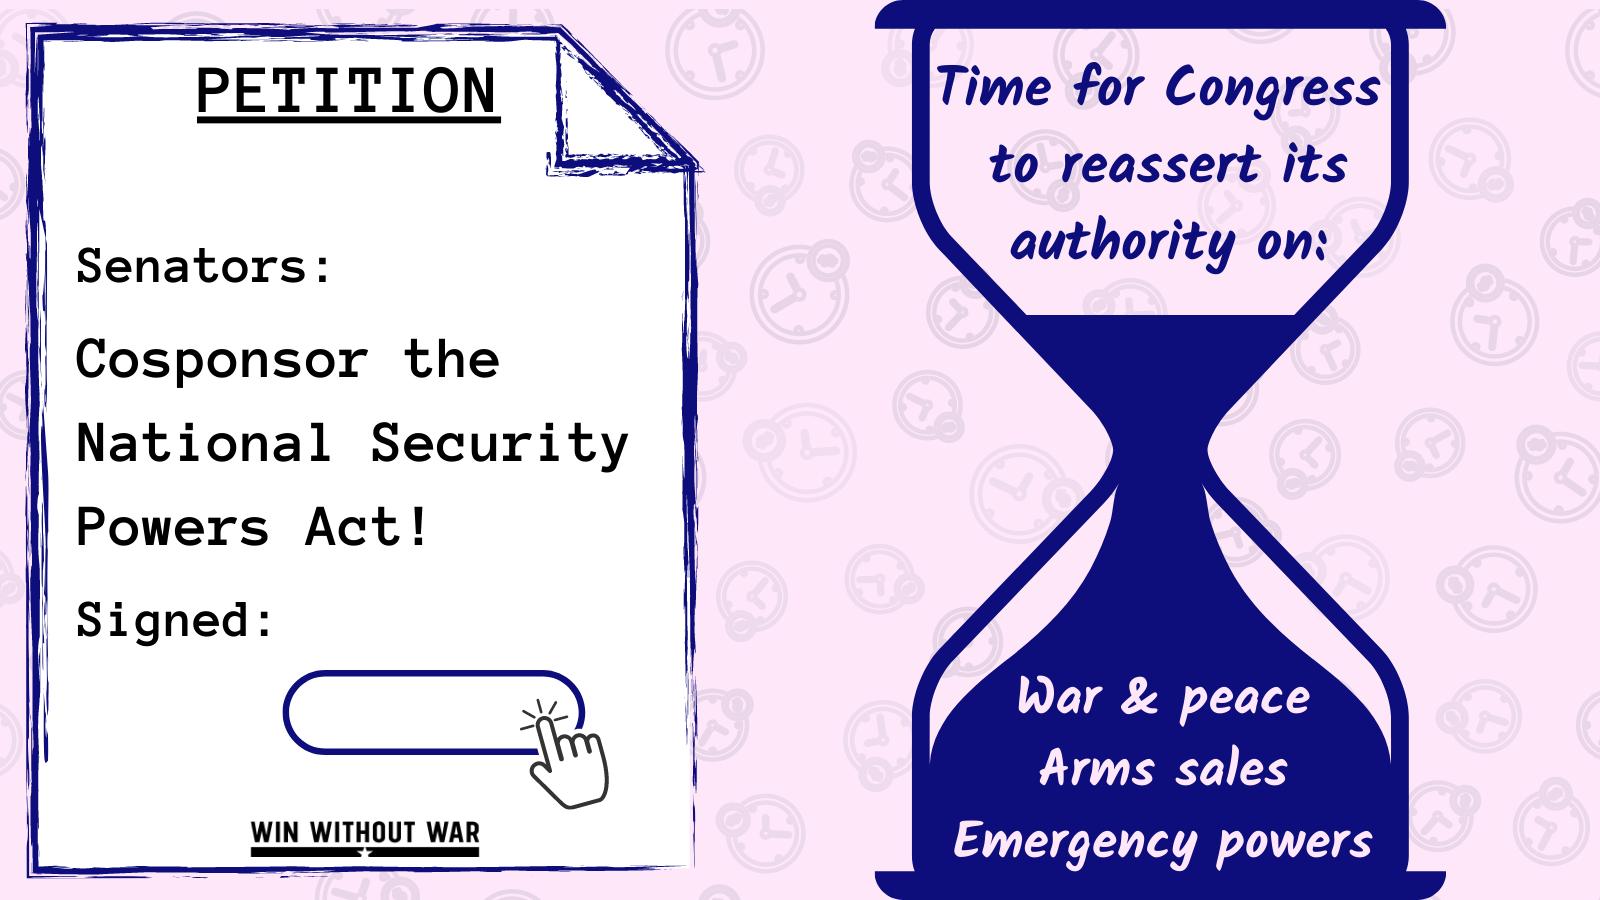 Senators: Cosponsor the National Security Powers Act!